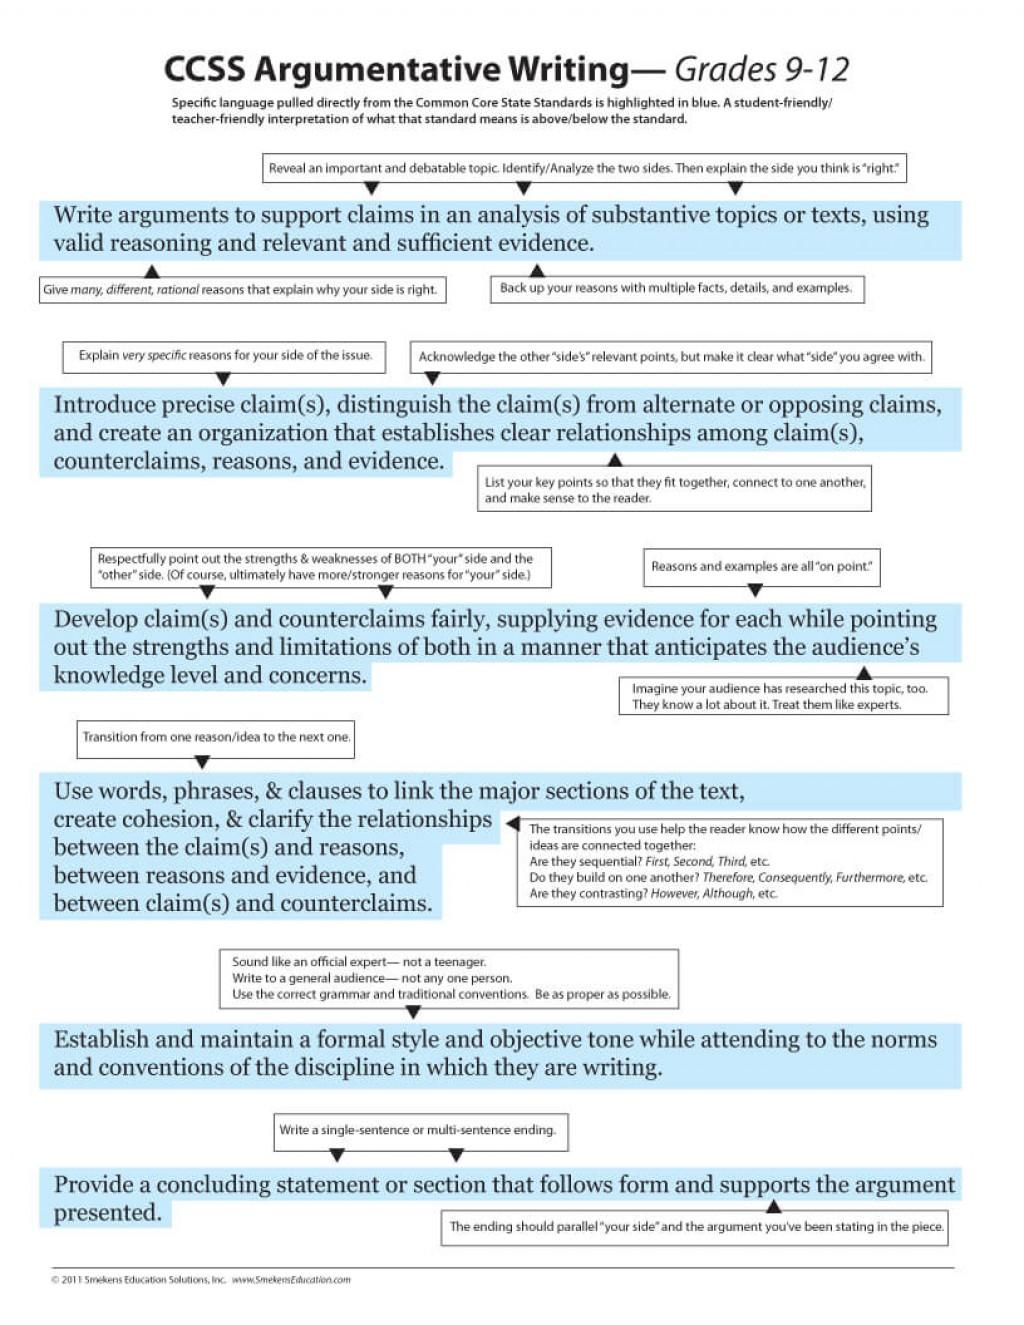 005 Parts Of Persuasive Essay Ccss Argumentative Grade 9 12o Imposing 6 A Large